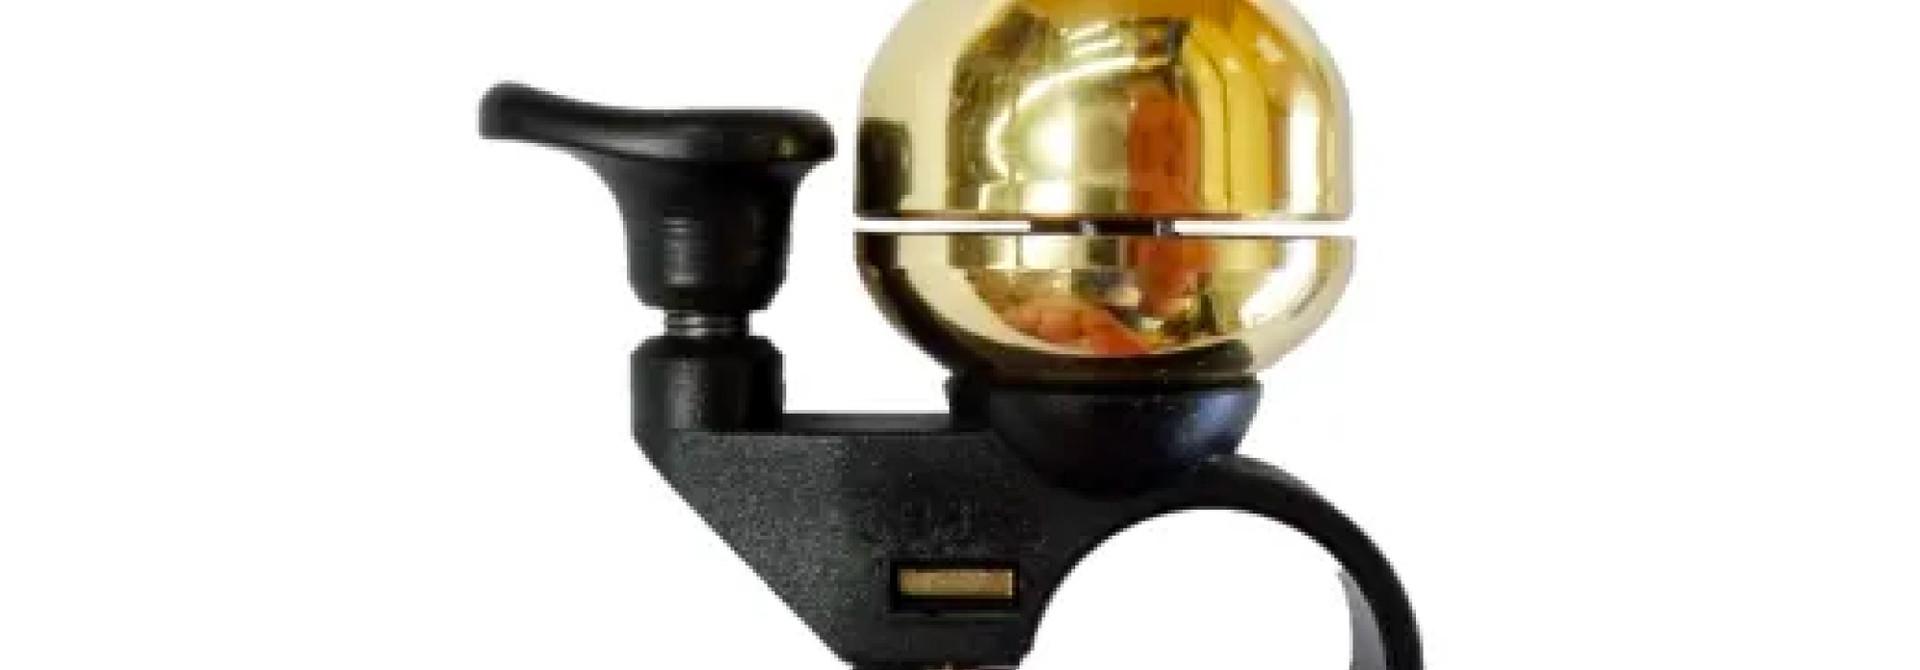 Brass Bell 25.4mm